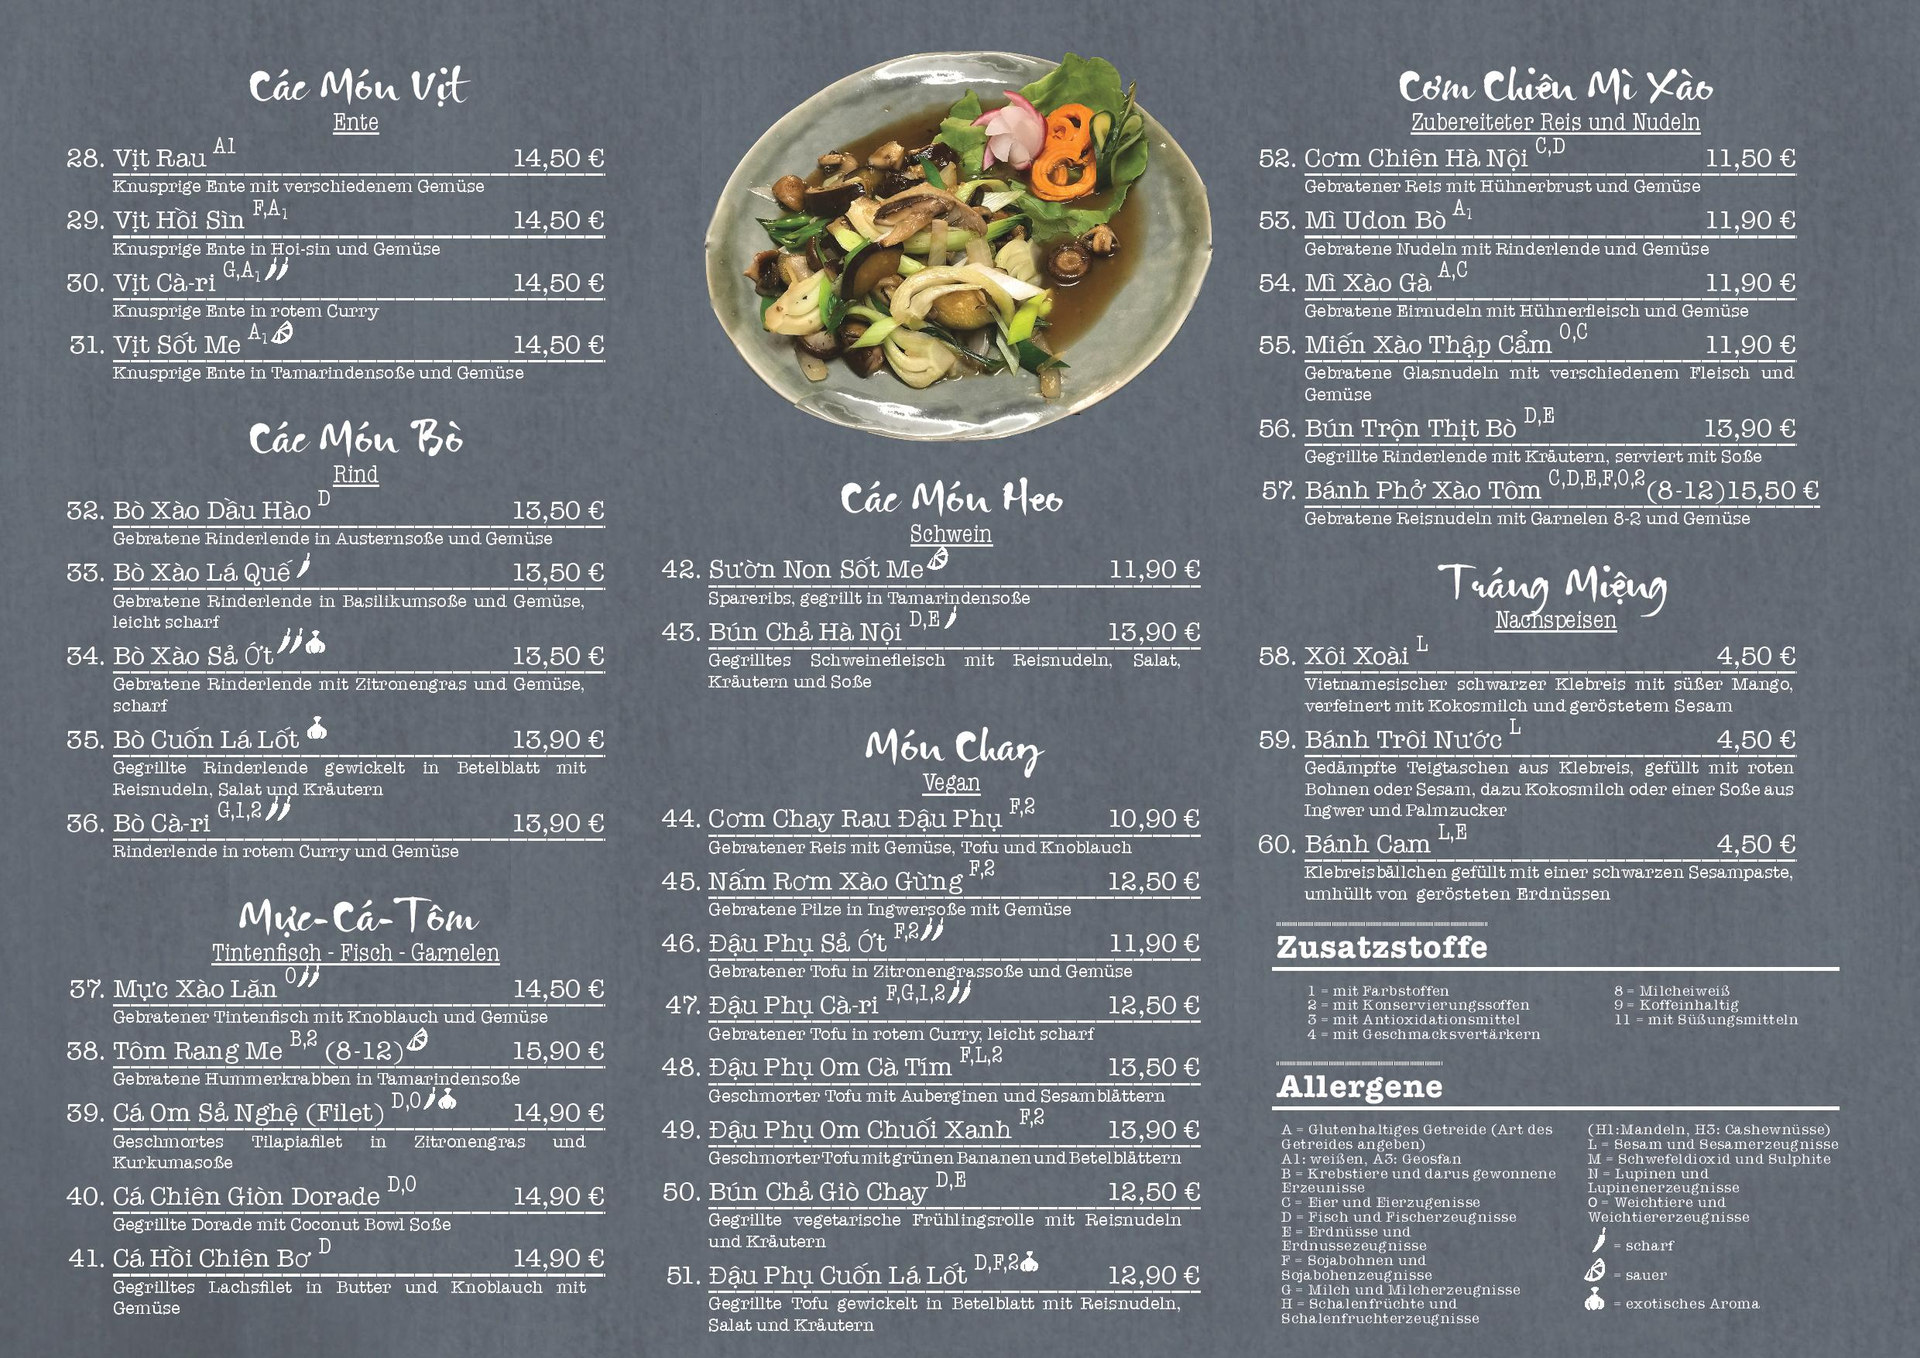 menu door-page-002.jpg